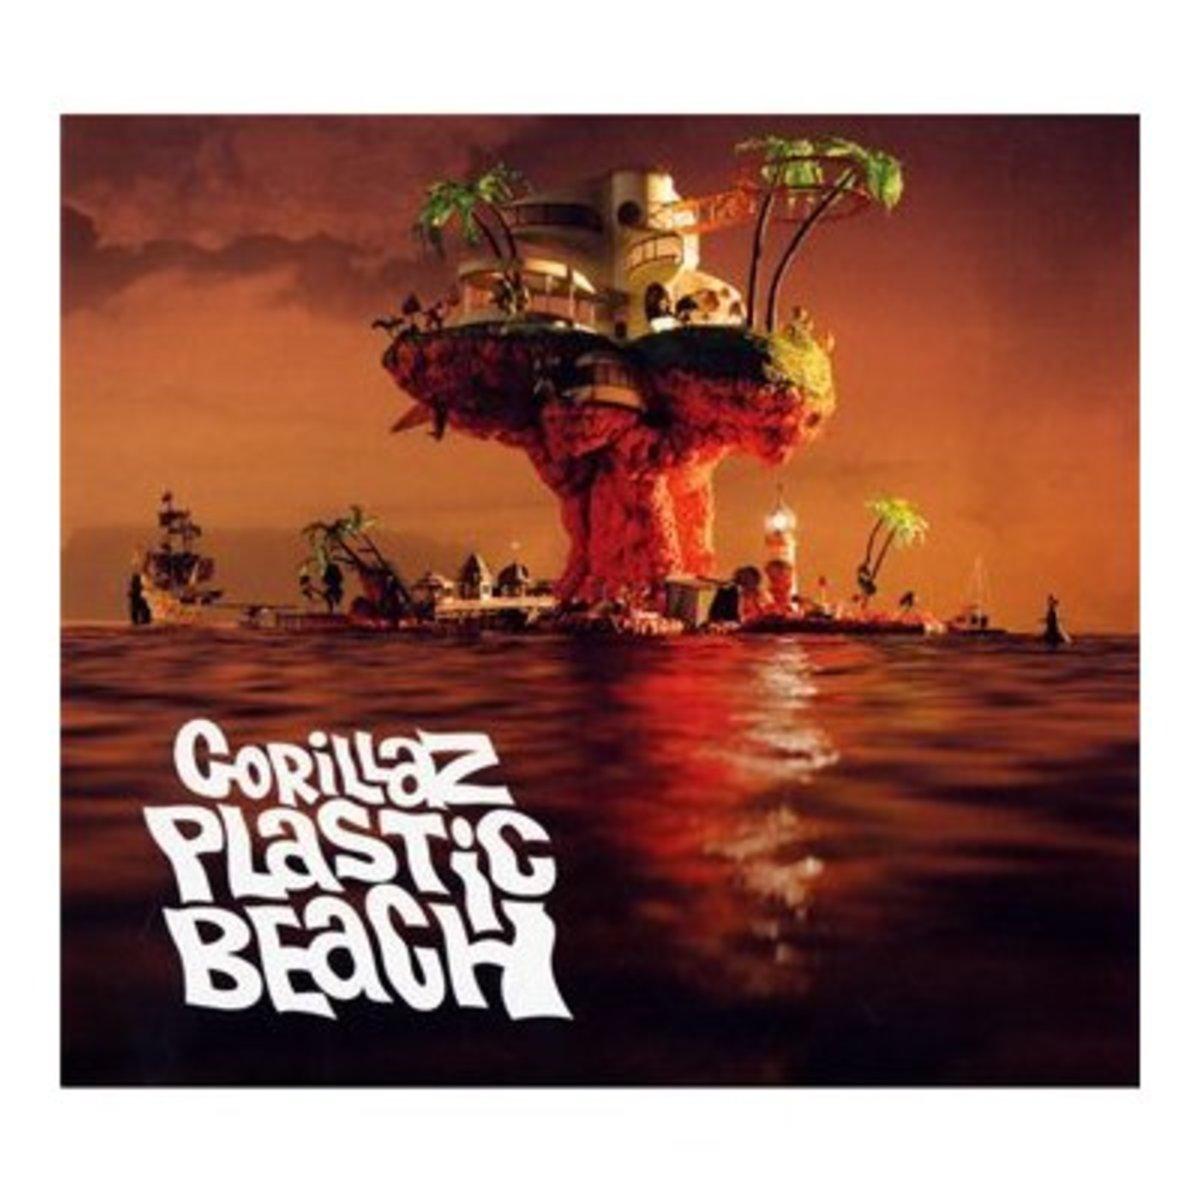 Plastic Beach is the latest album from Gorillaz.